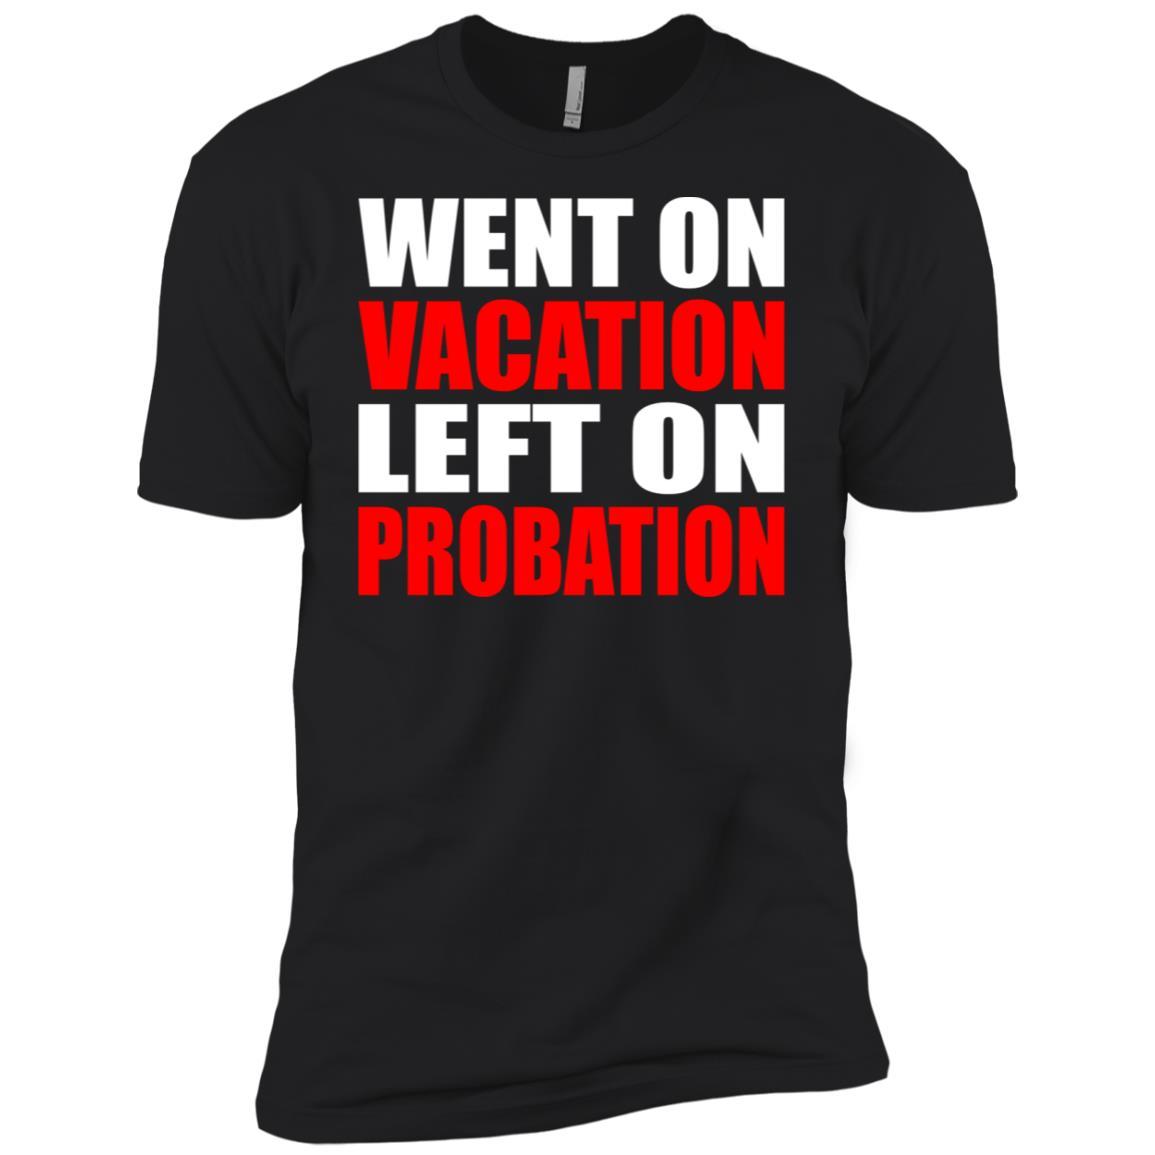 Went On Vacation Left On Probation – Funny Travel Humor Joke Men Short Sleeve T-Shirt